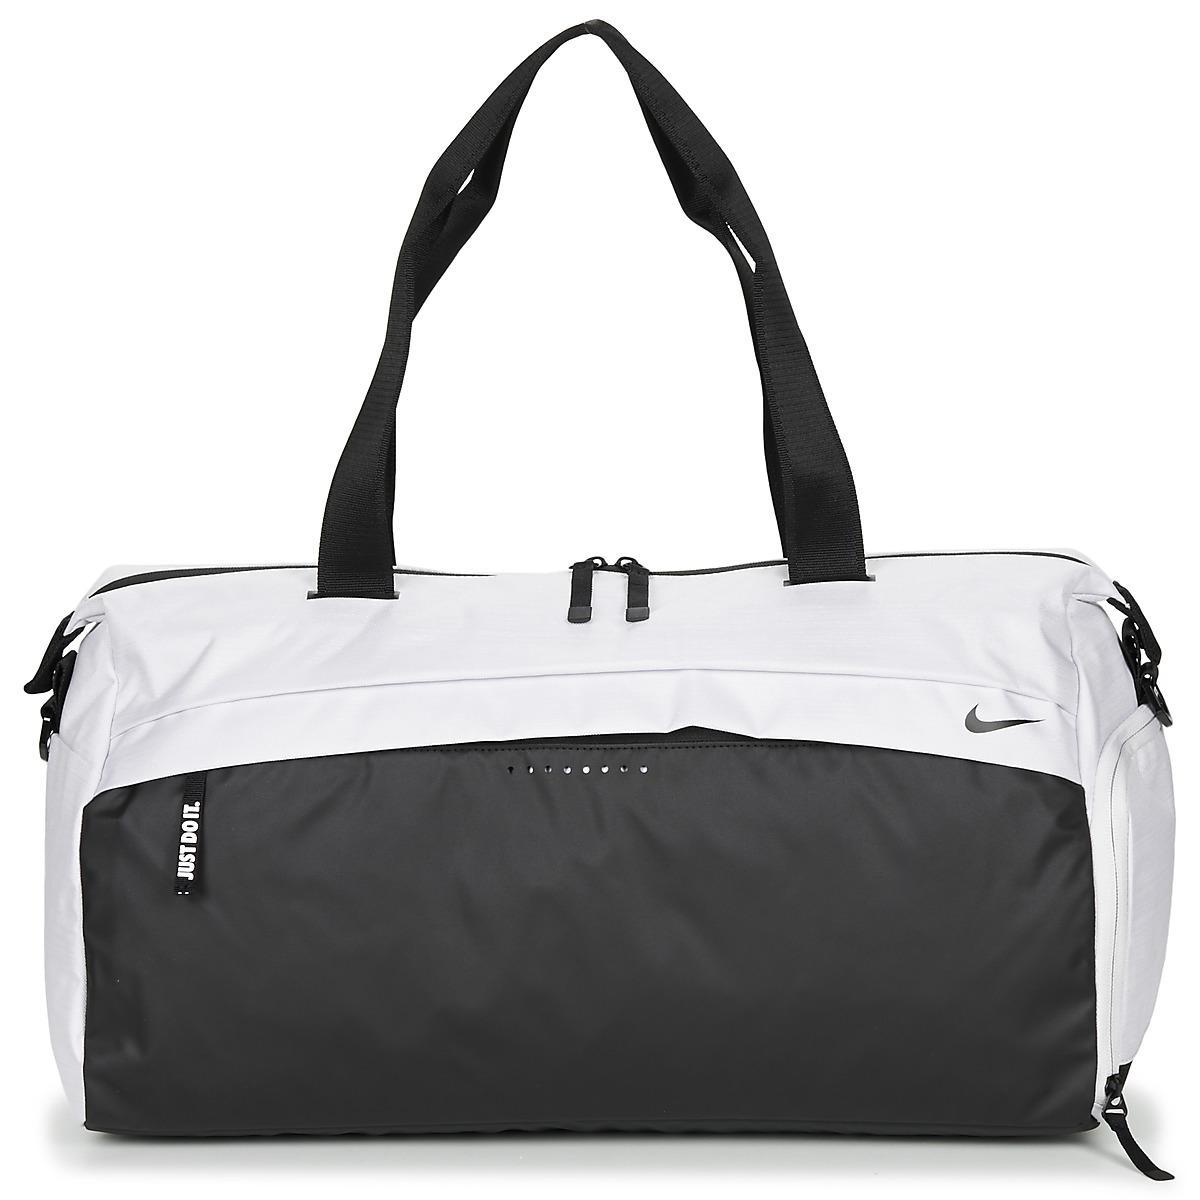 6751b4cd7c Nike Radiate Women s Sports Bag In Black in Black for Men - Lyst